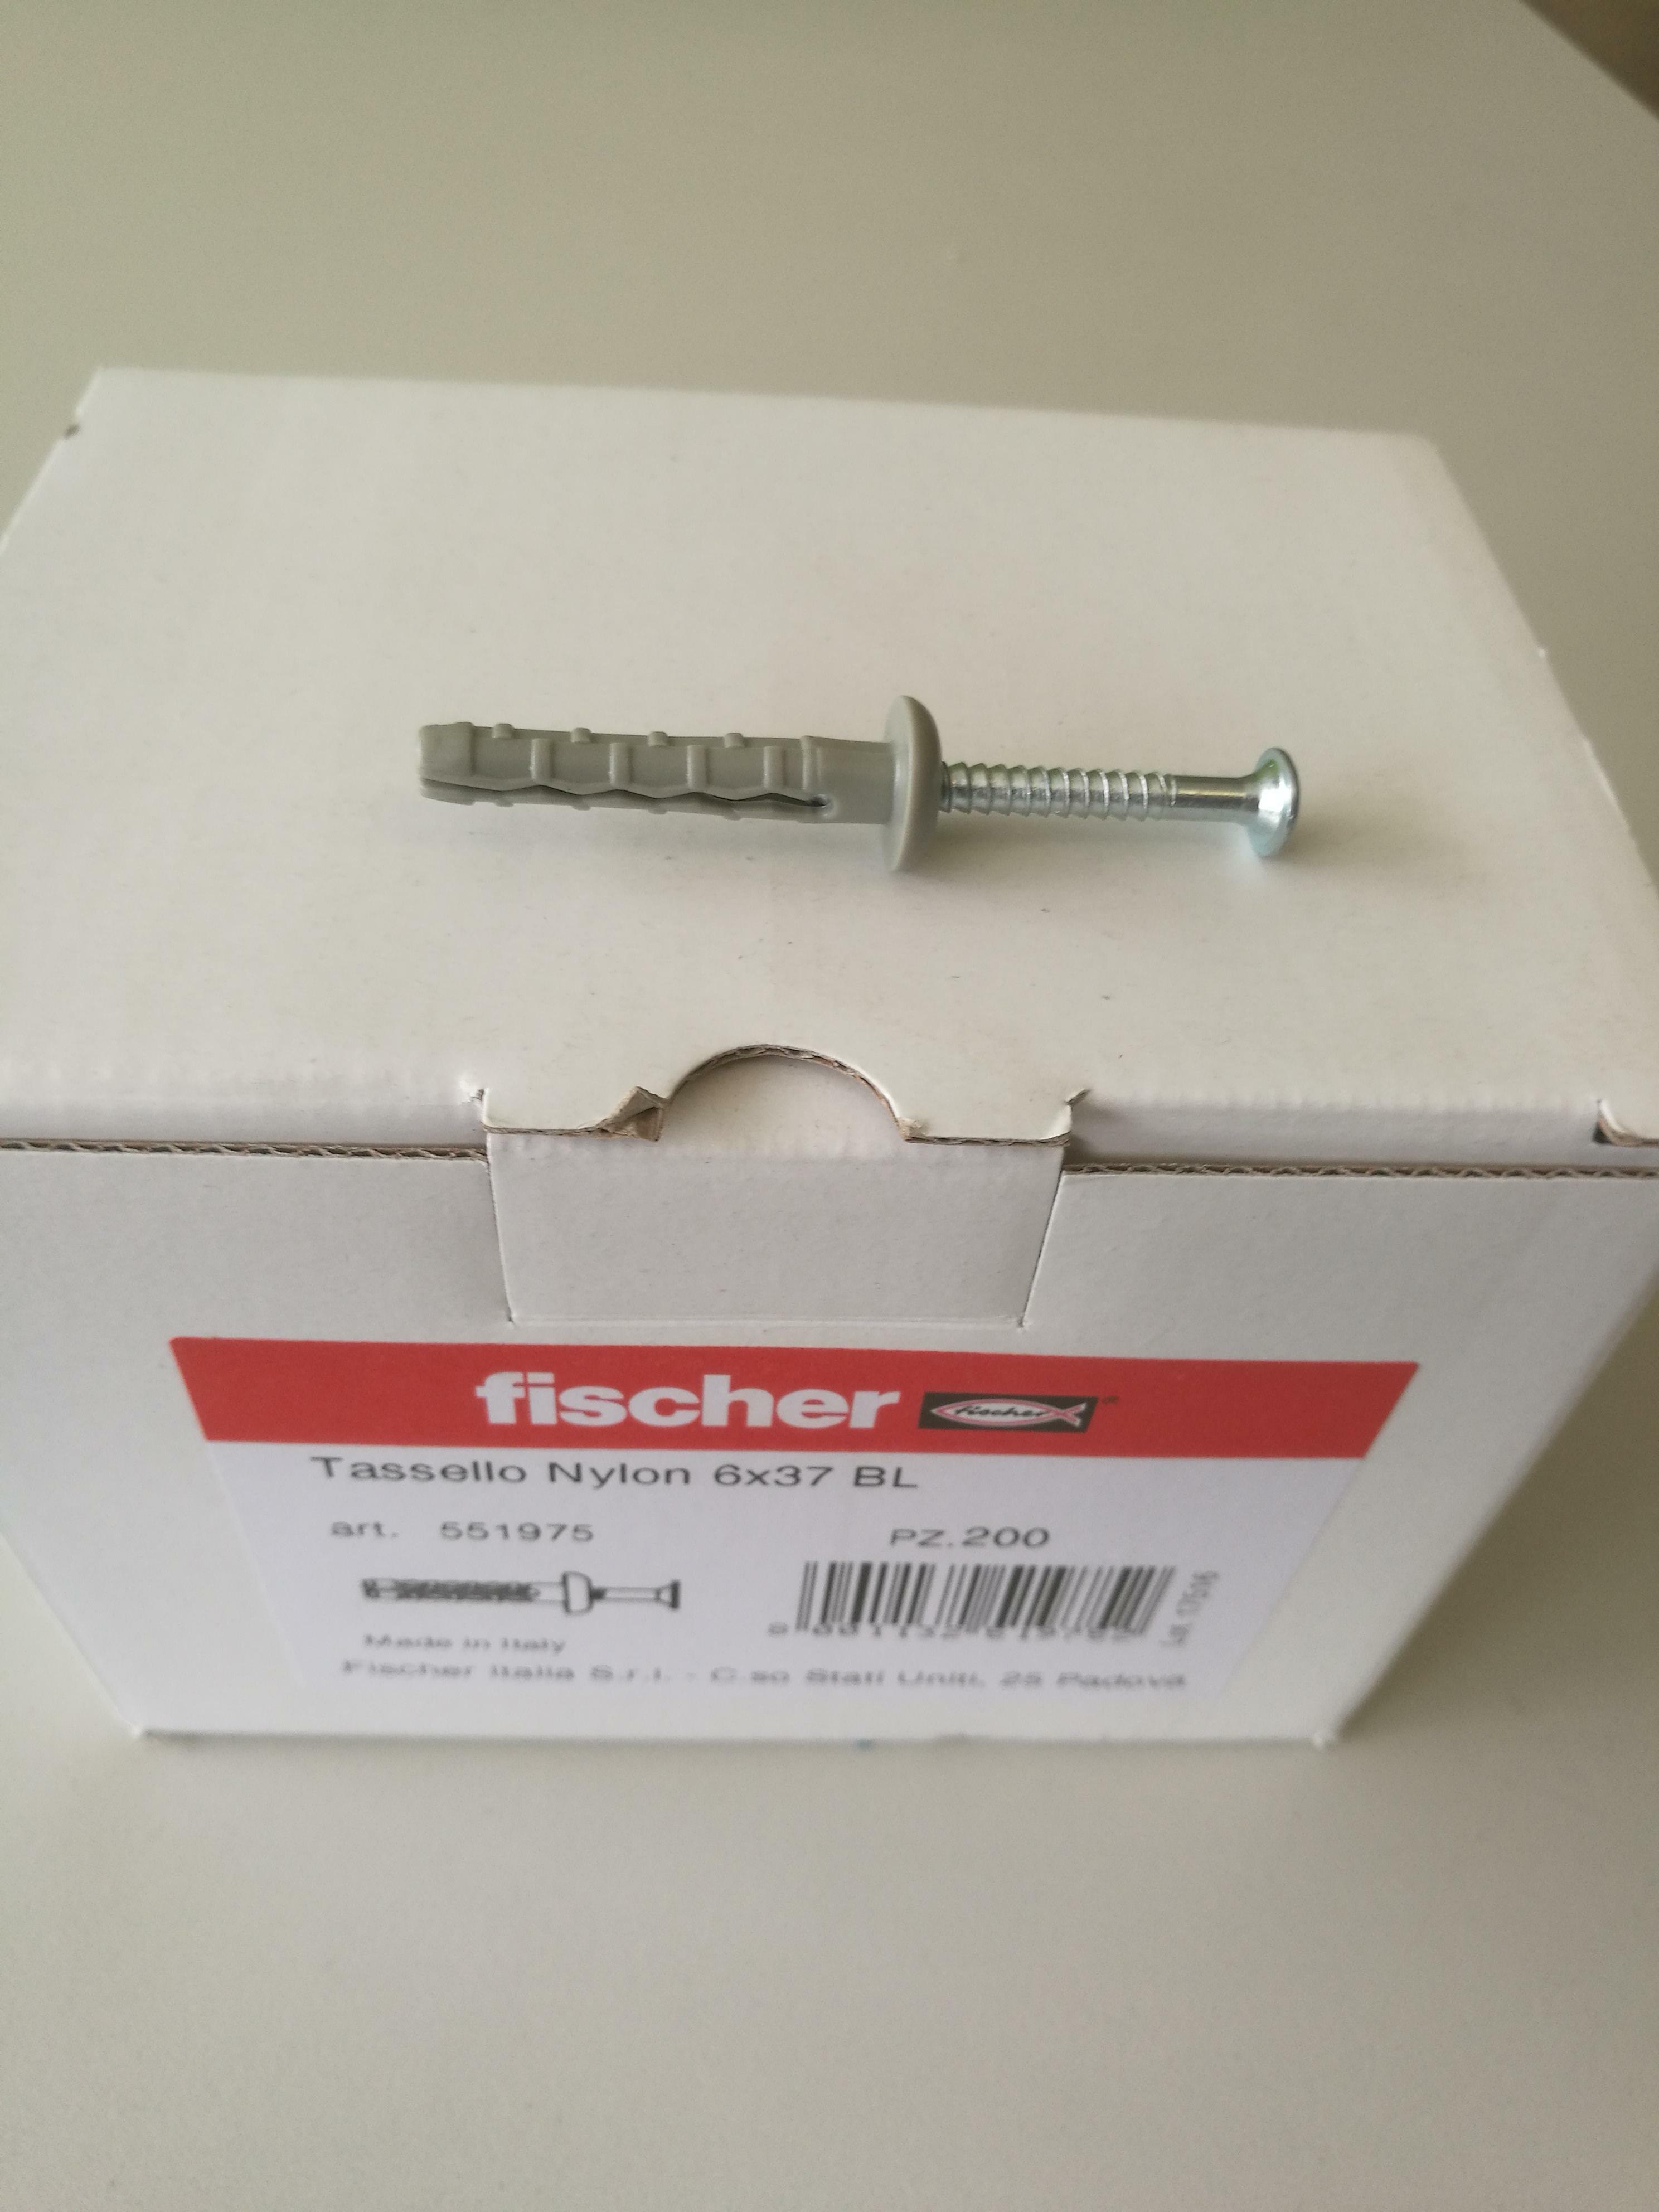 fischer fischer tassello nylon 6x37 a battuta confezione da 200 pz